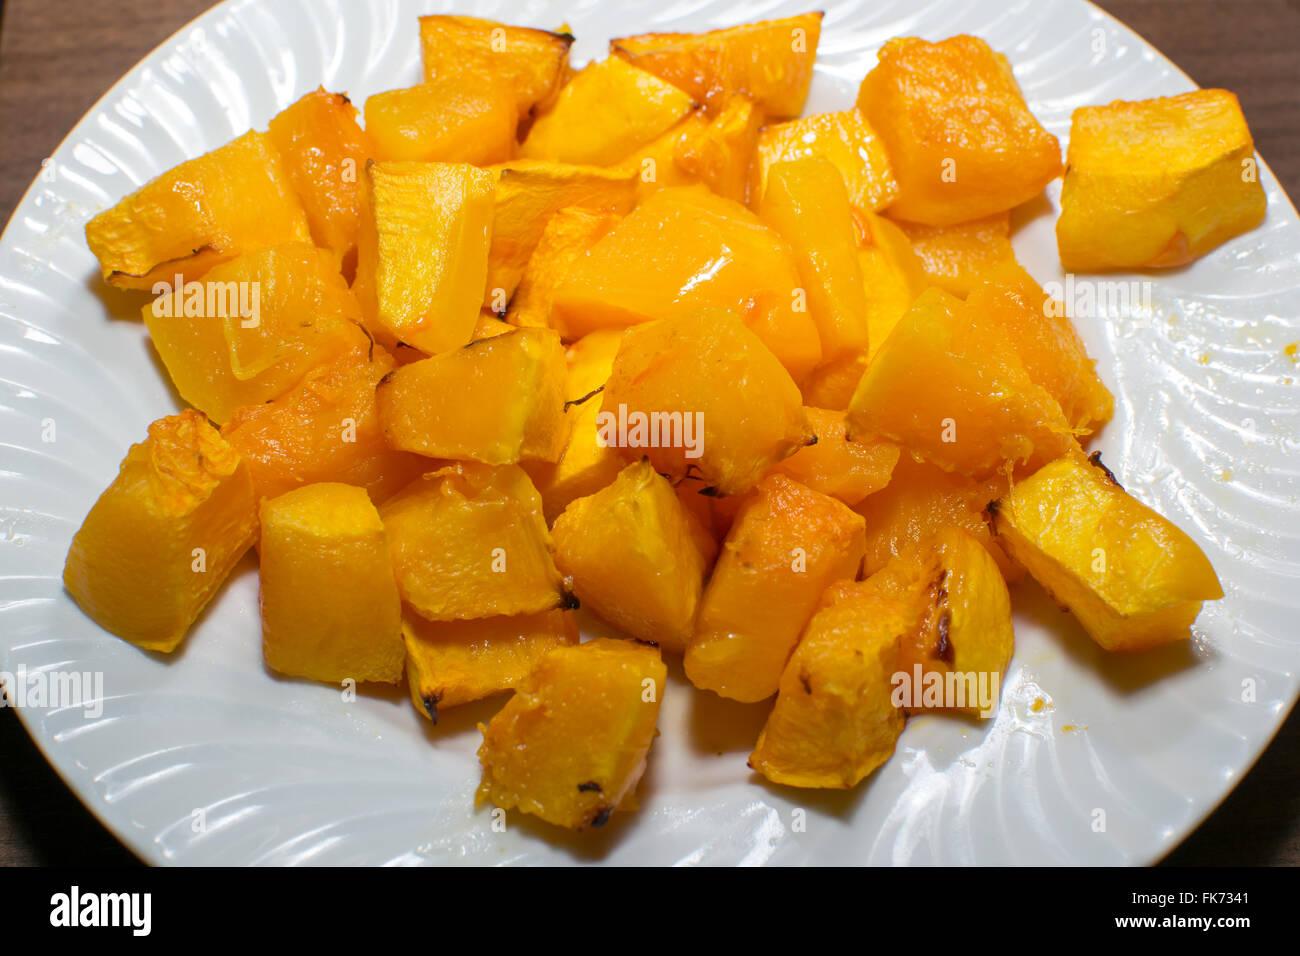 people vegetable healthy pumpkin food eating nature Stock Photo